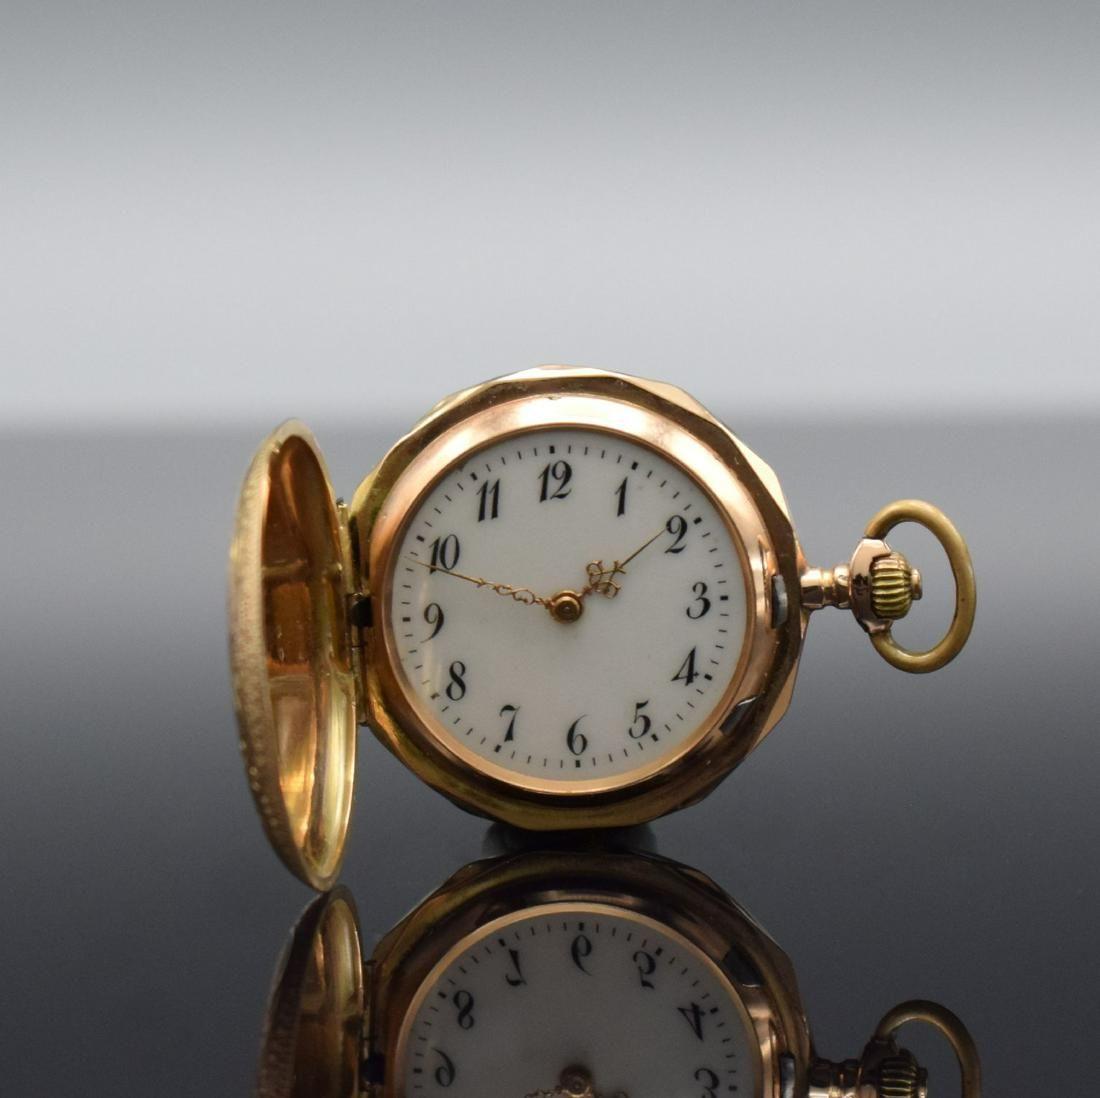 MONOPOL / DÜRRSTEIN & Co. 14k gold ladies pocket watch